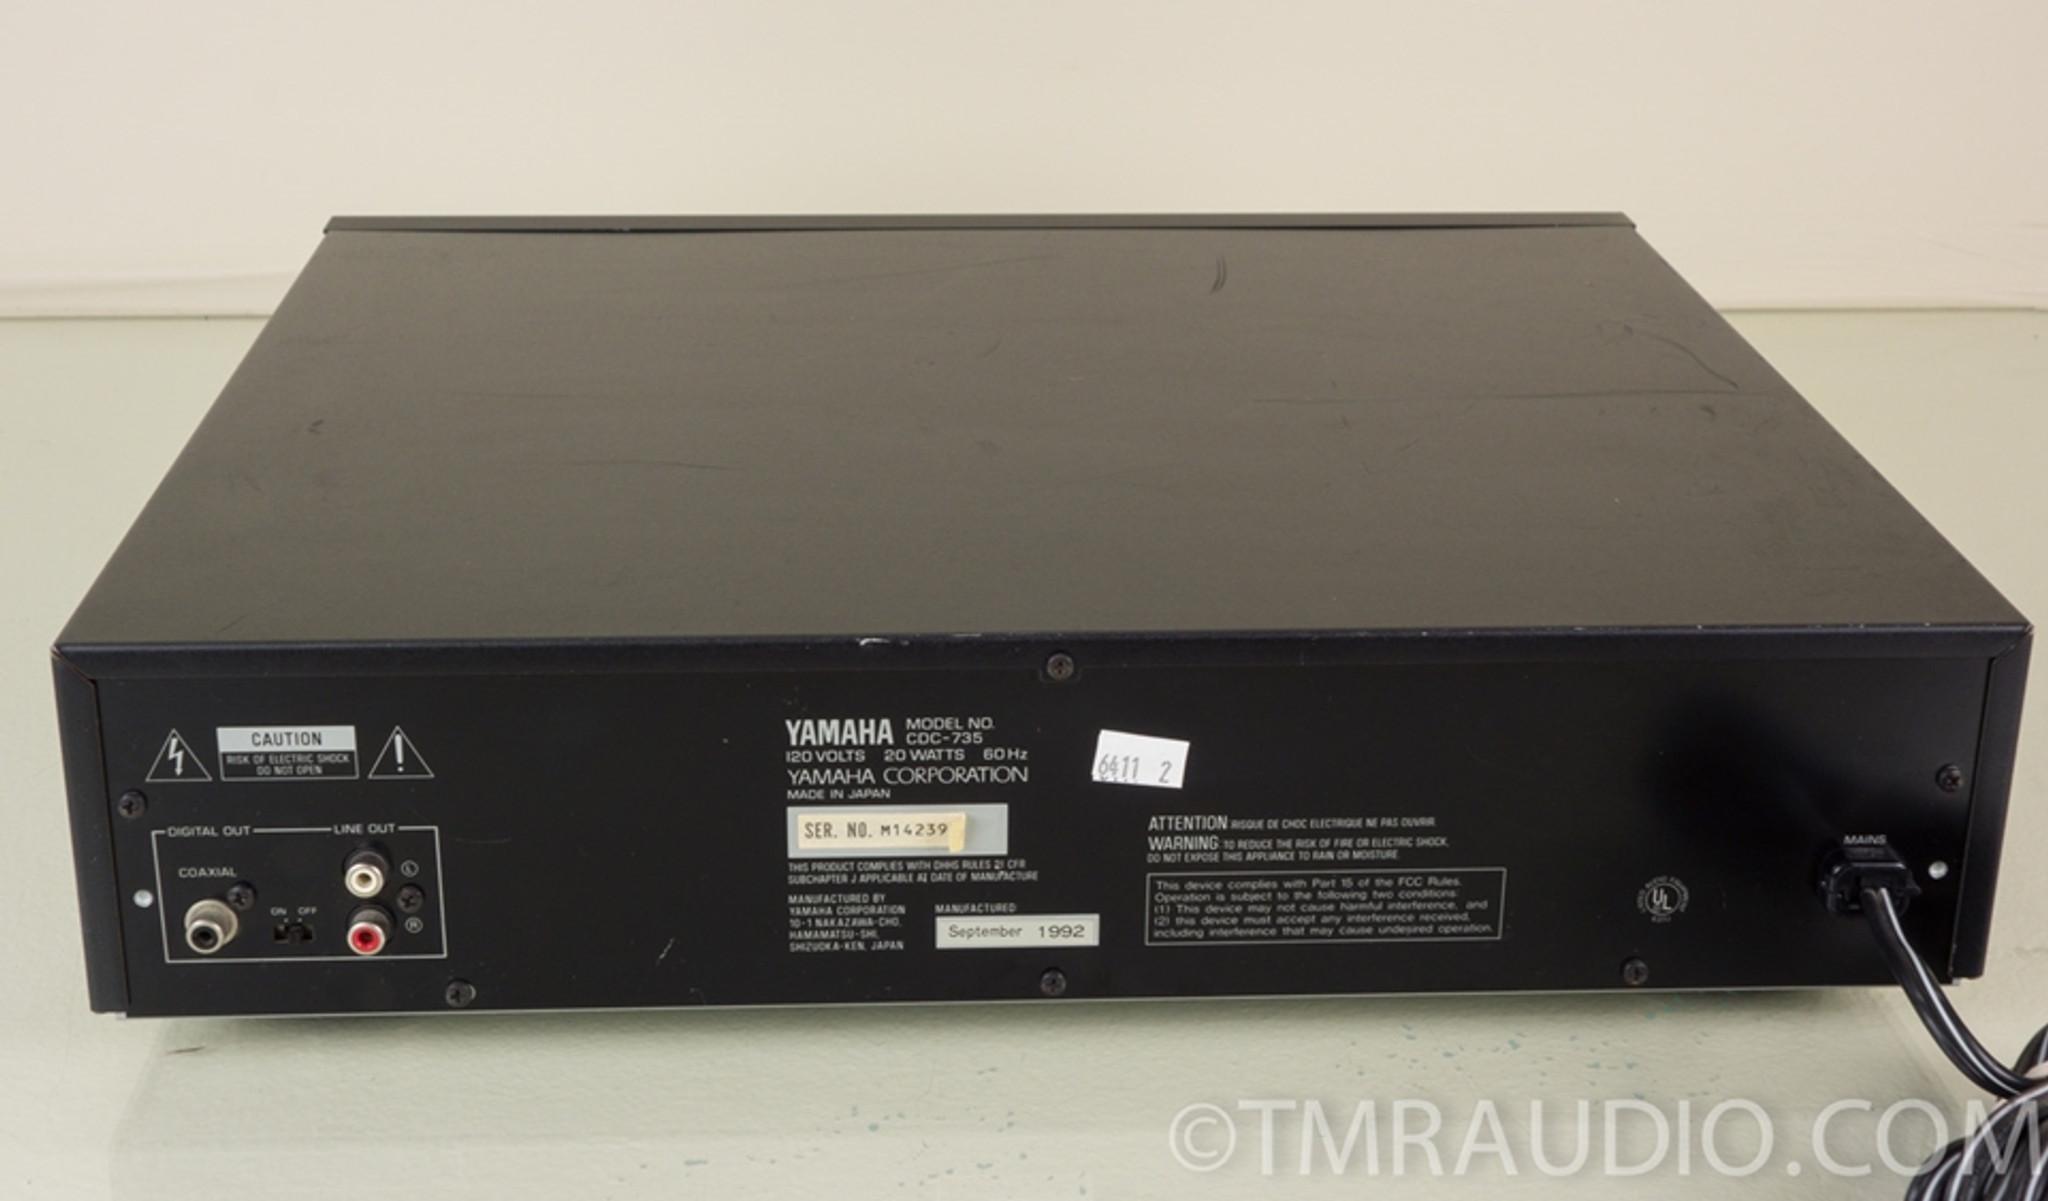 Yamaha Cdc 735 5 Disc Cd Changer Player The Music Room